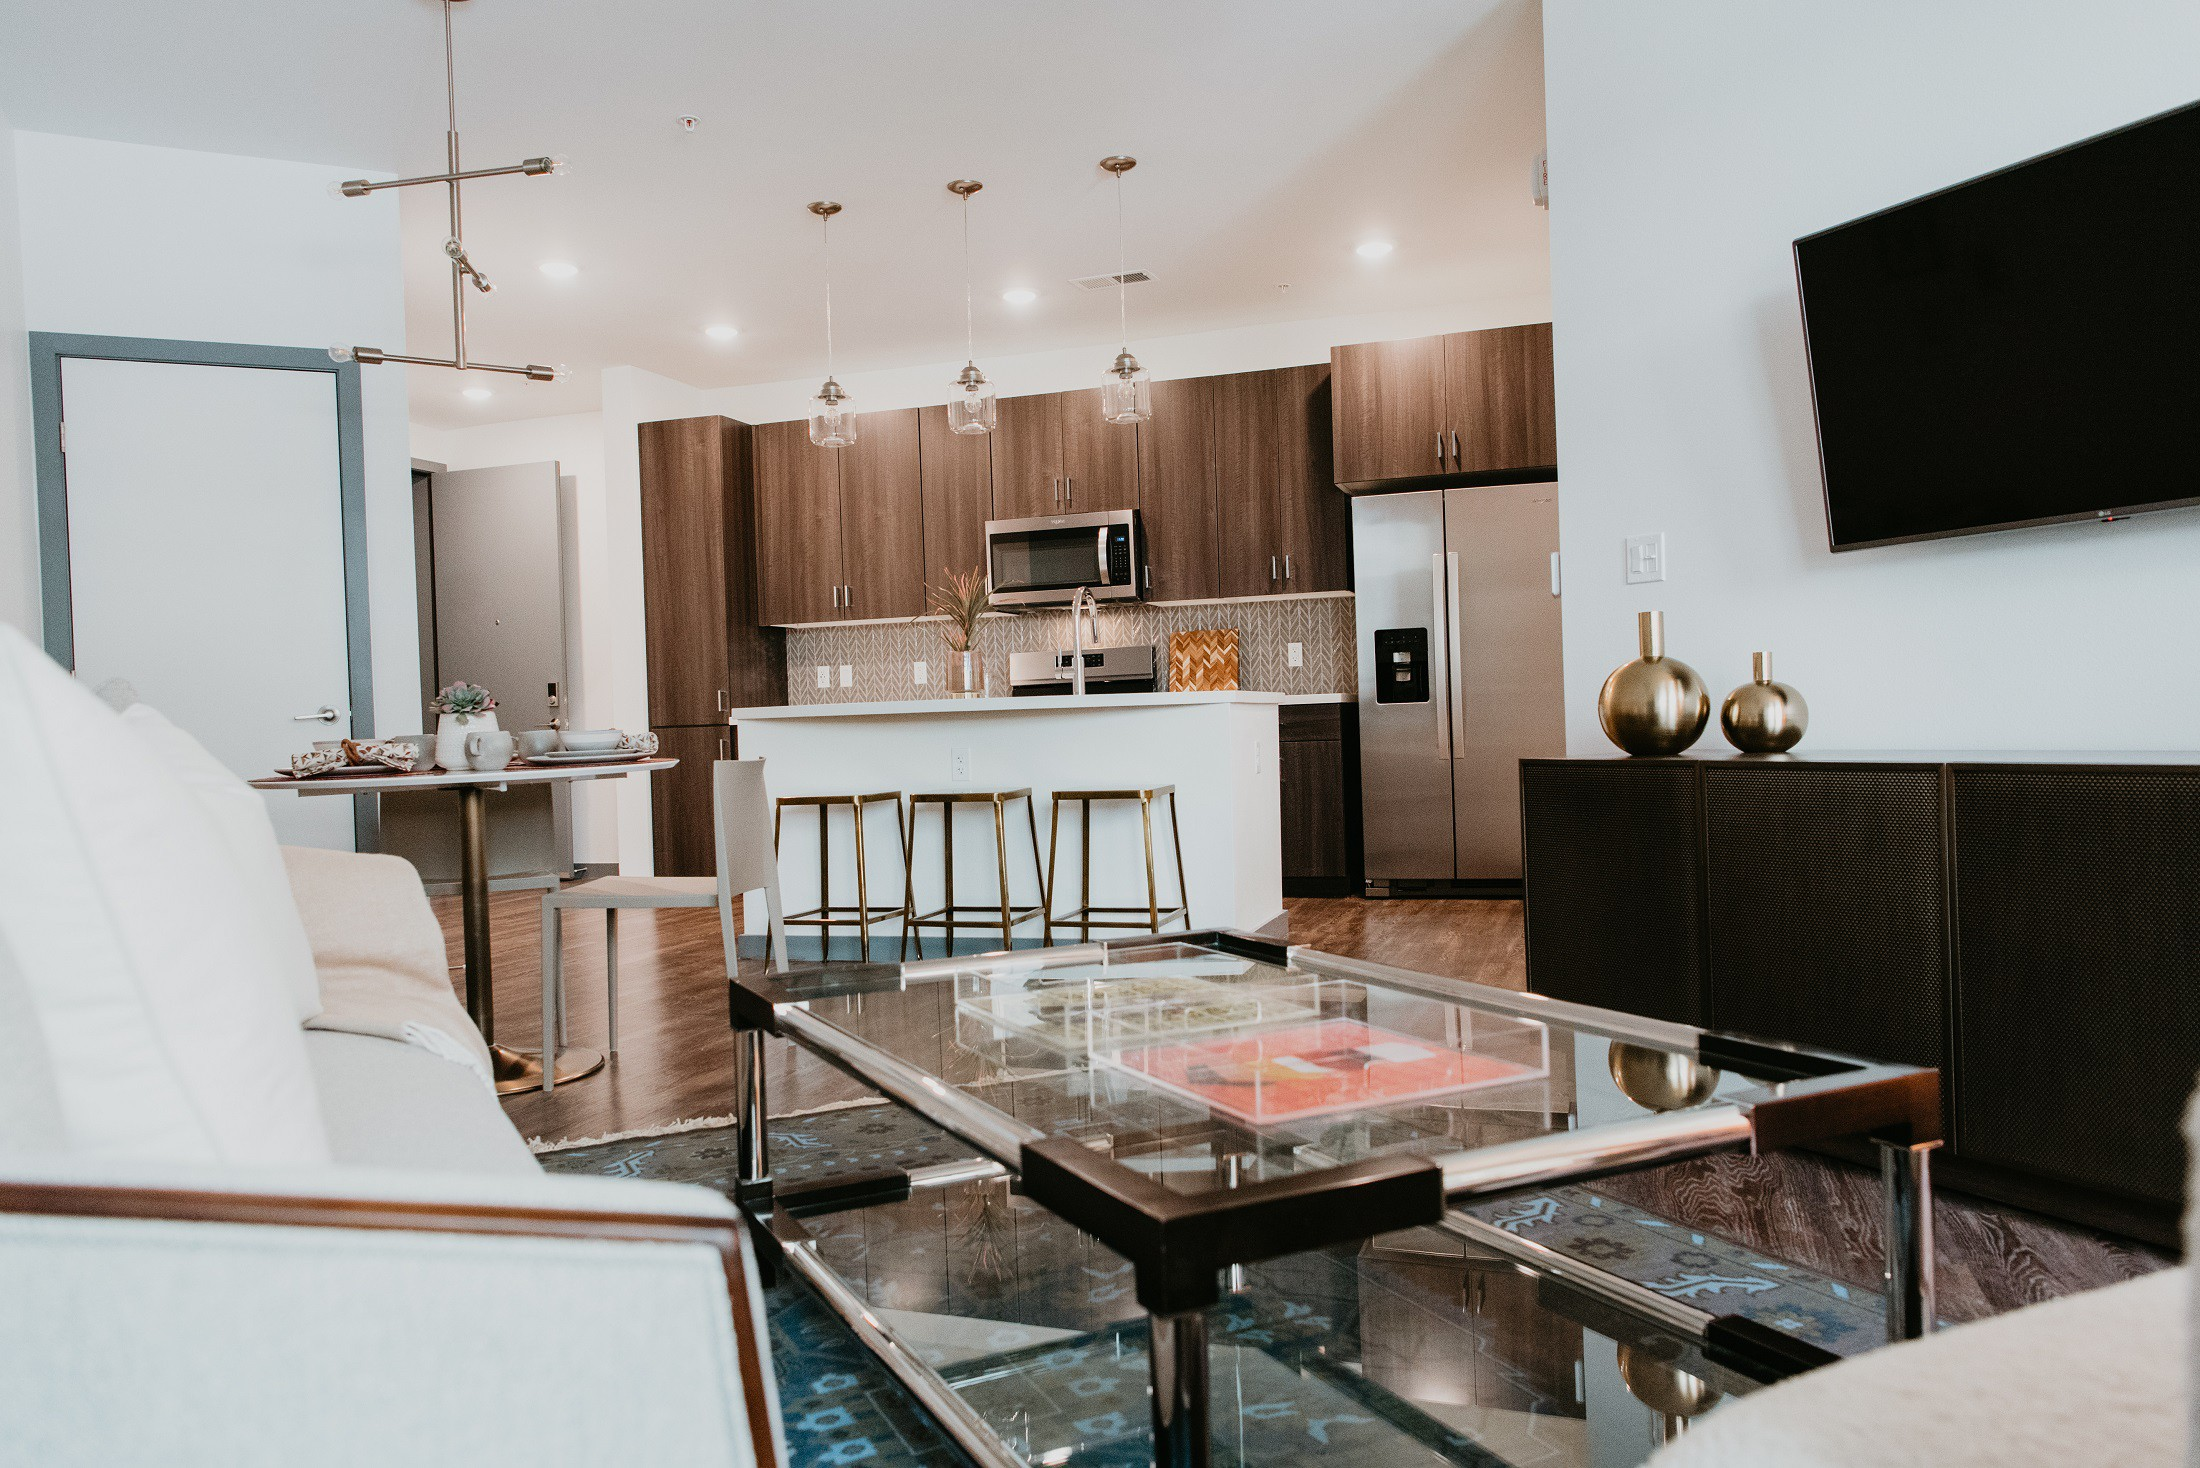 Apartments Near University of Phoenix-Nevada Tanager for University of Phoenix-Nevada Students in Las Vegas, NV